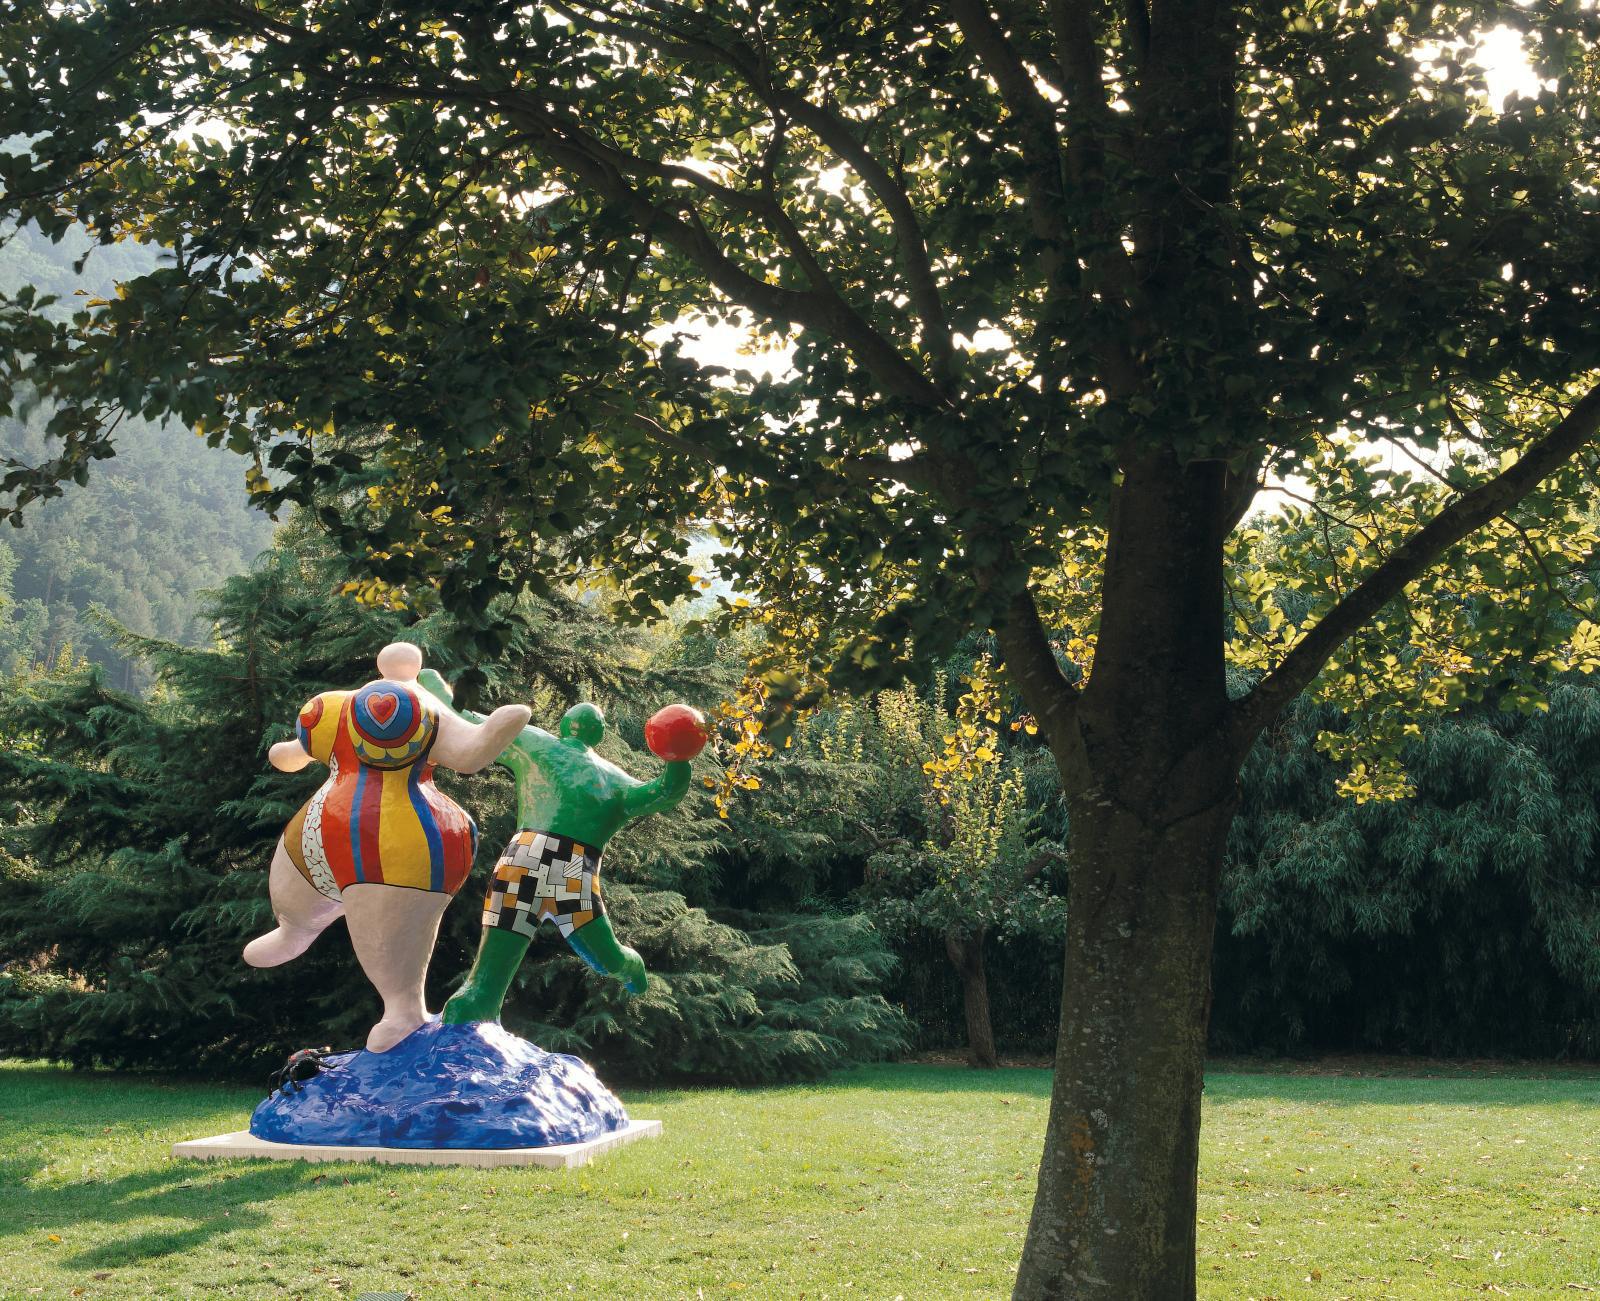 Niki de Saint Phalle, Les Baigneuses (The Bathers).© Michel Darbellay